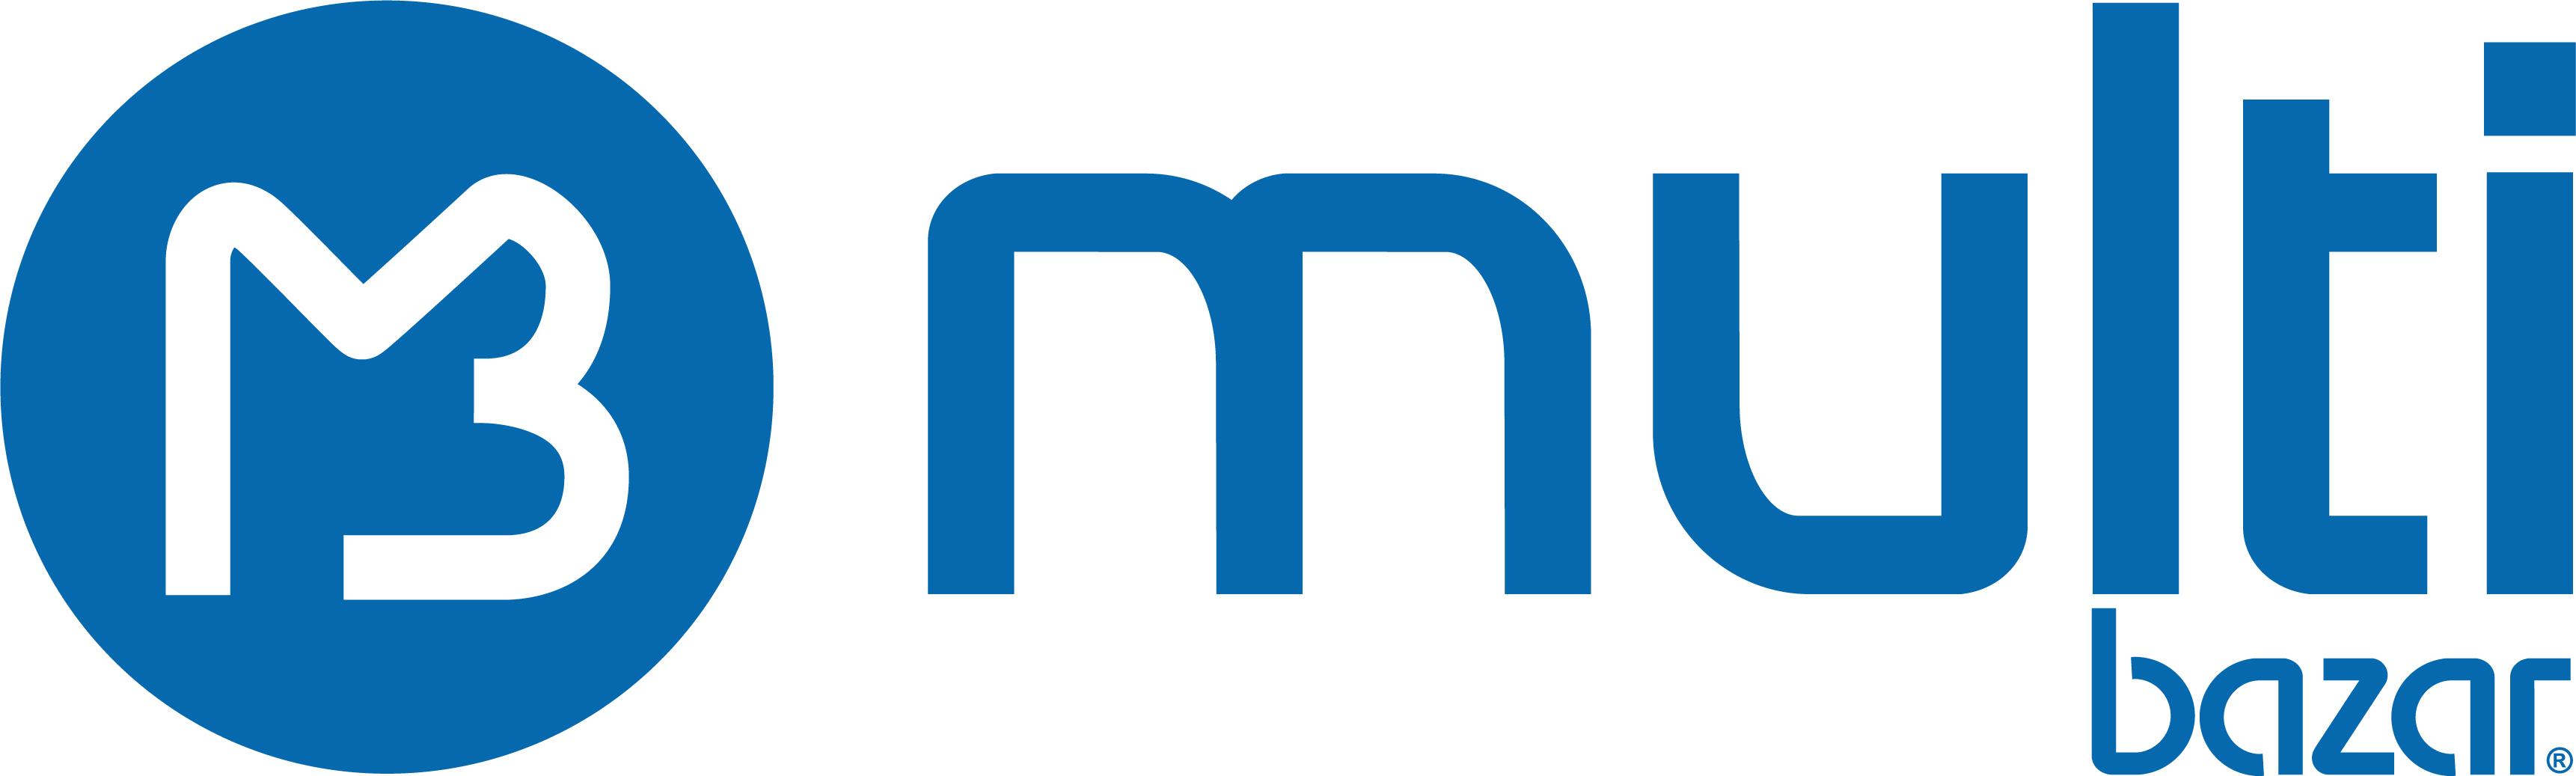 Multi Bazar promotie : Dag Van De Webshop